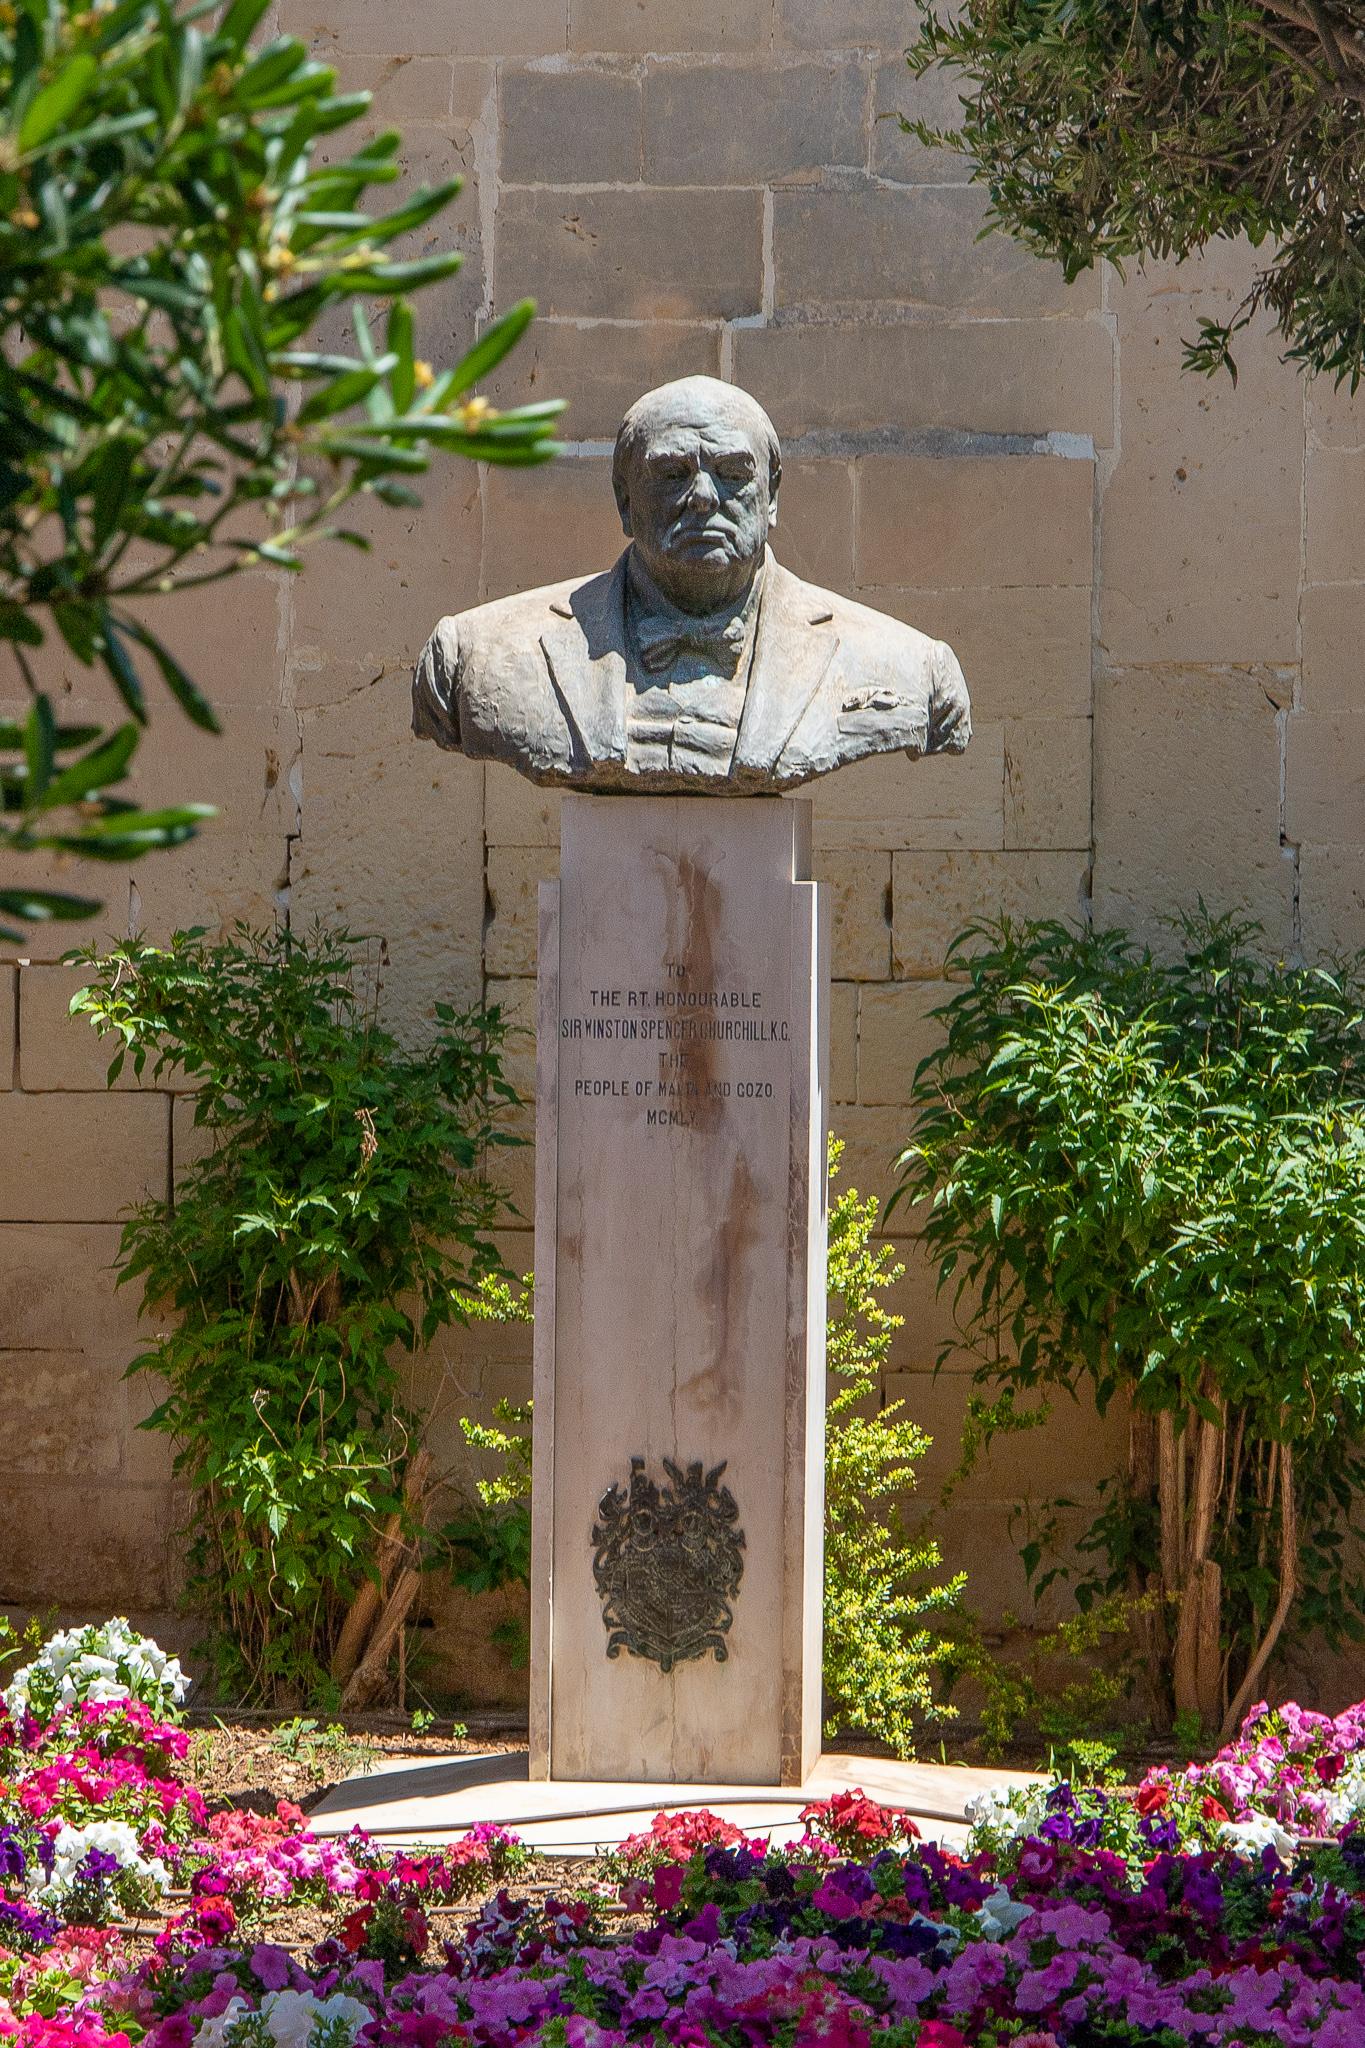 The bust of Sir Winston Churchill